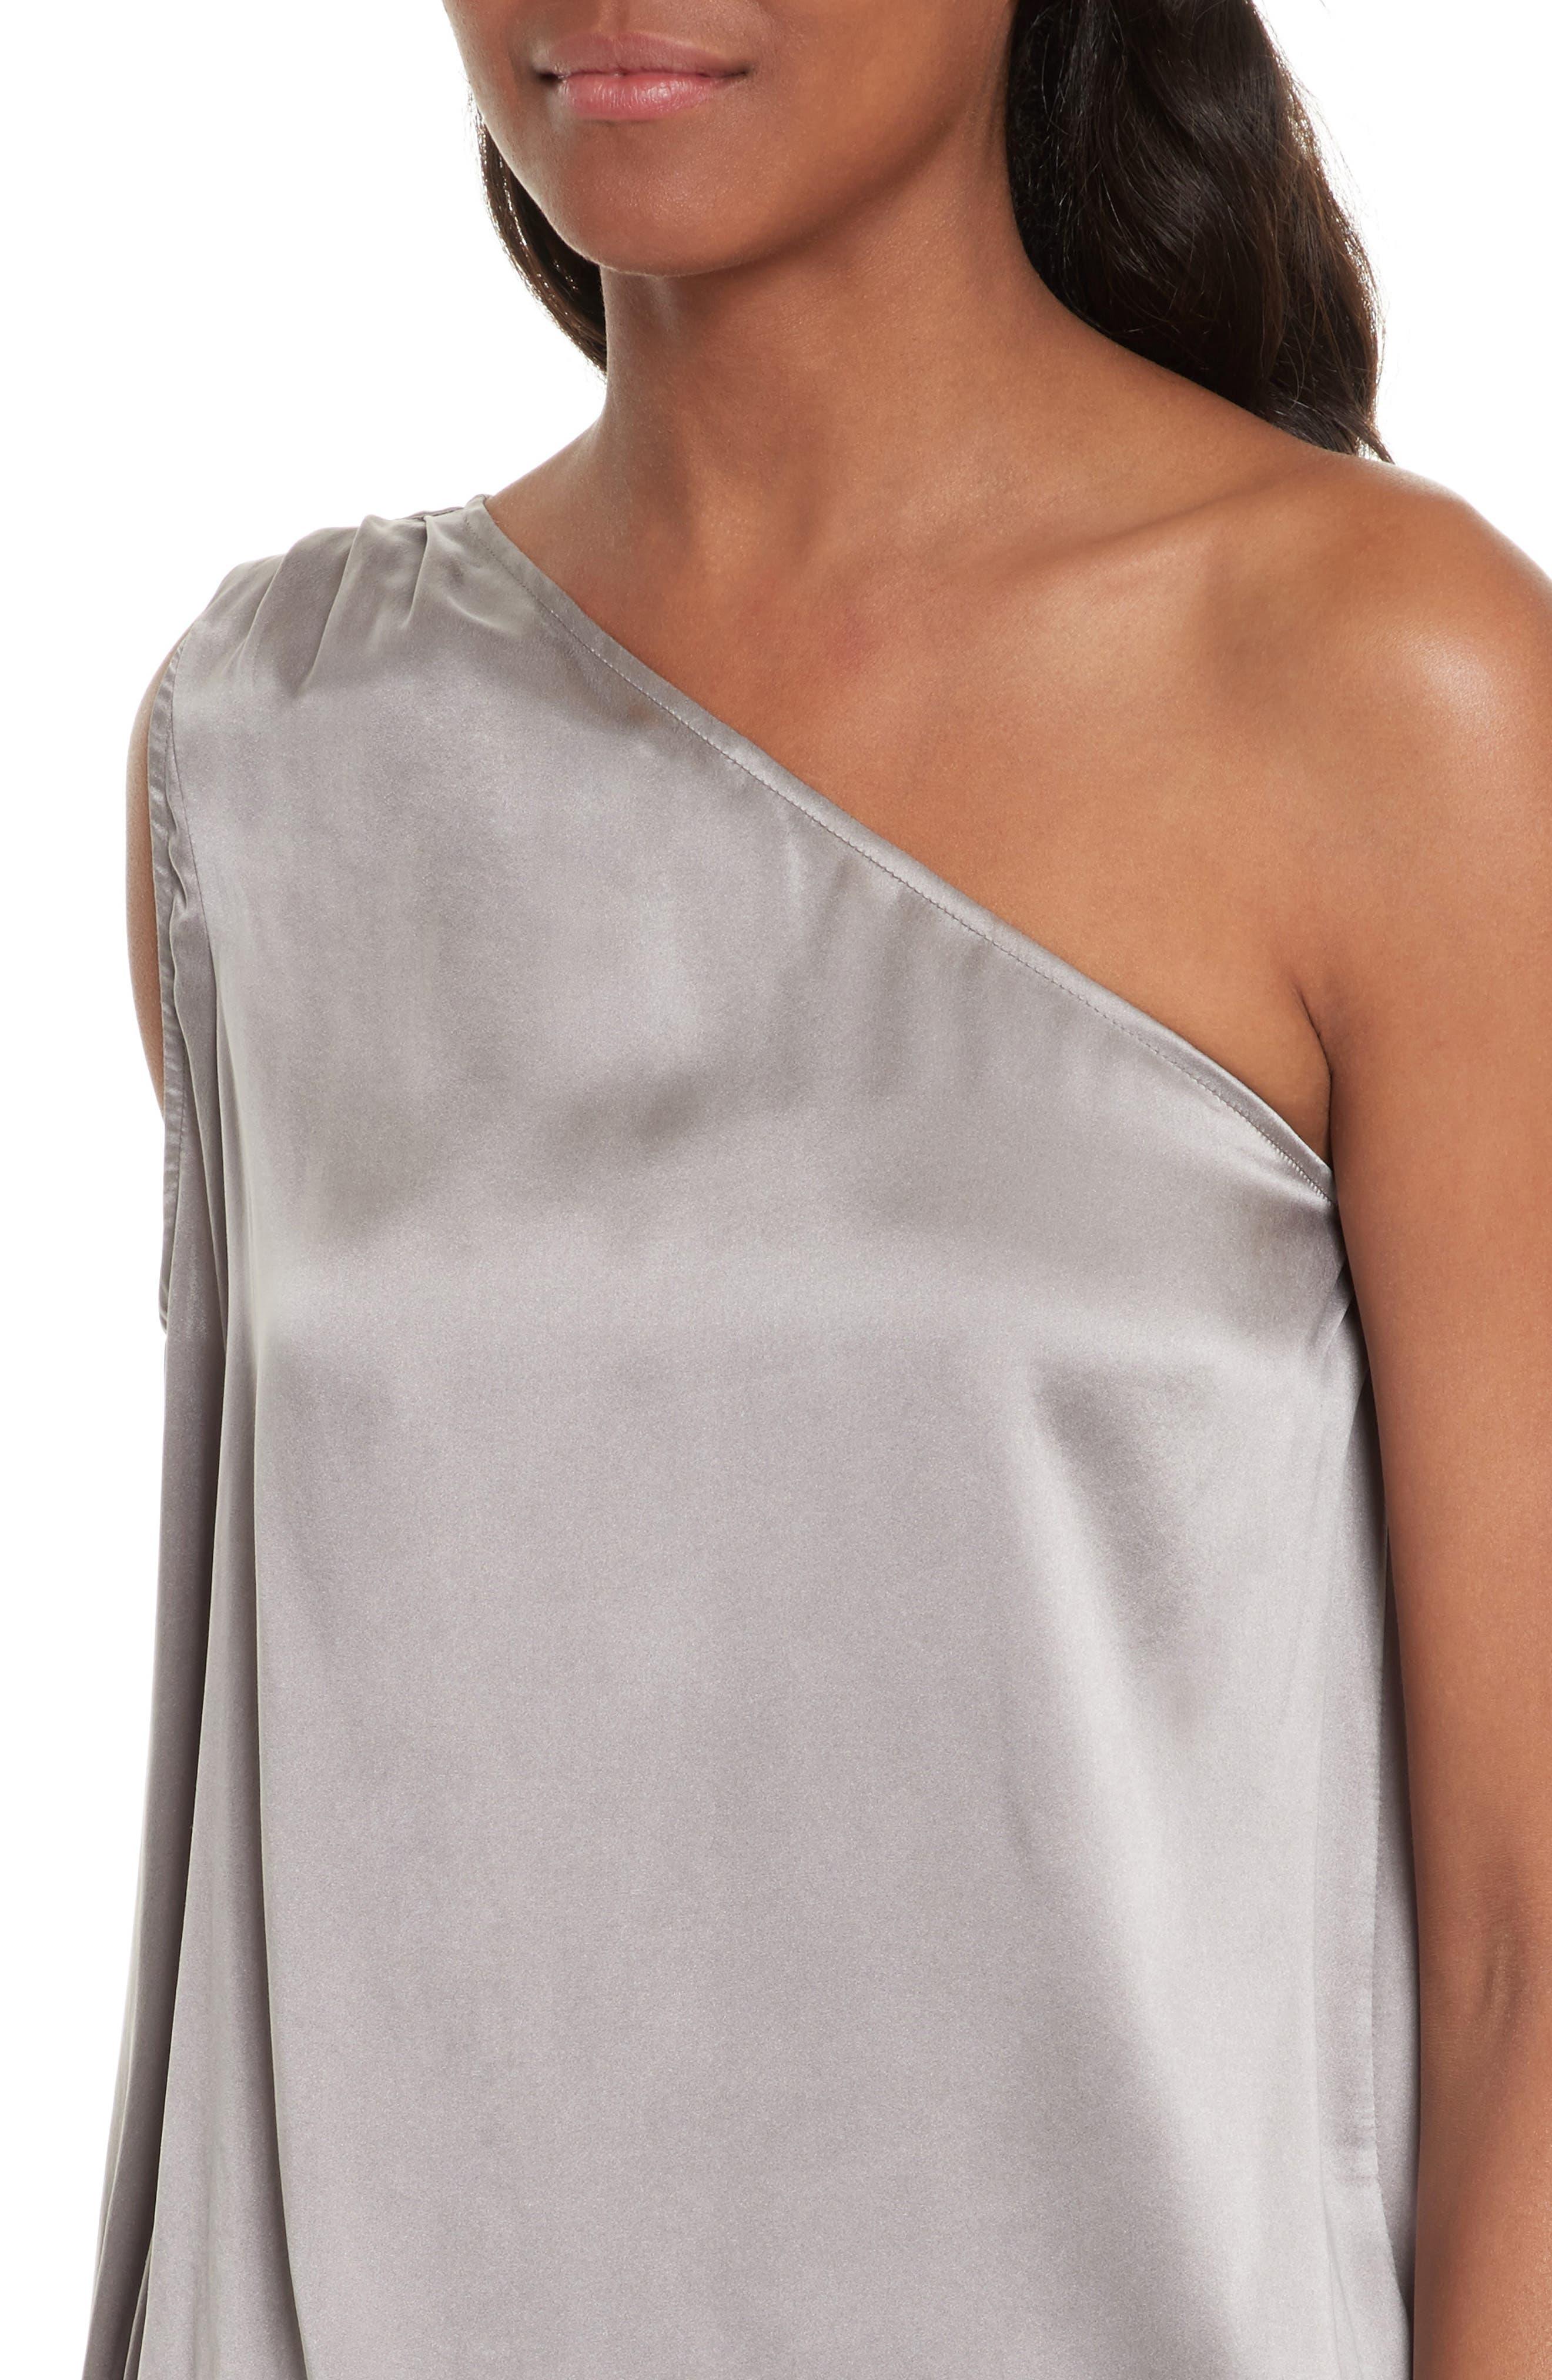 Abatha One-Shoulder Silk Top,                             Alternate thumbnail 4, color,                             Vintage Silver